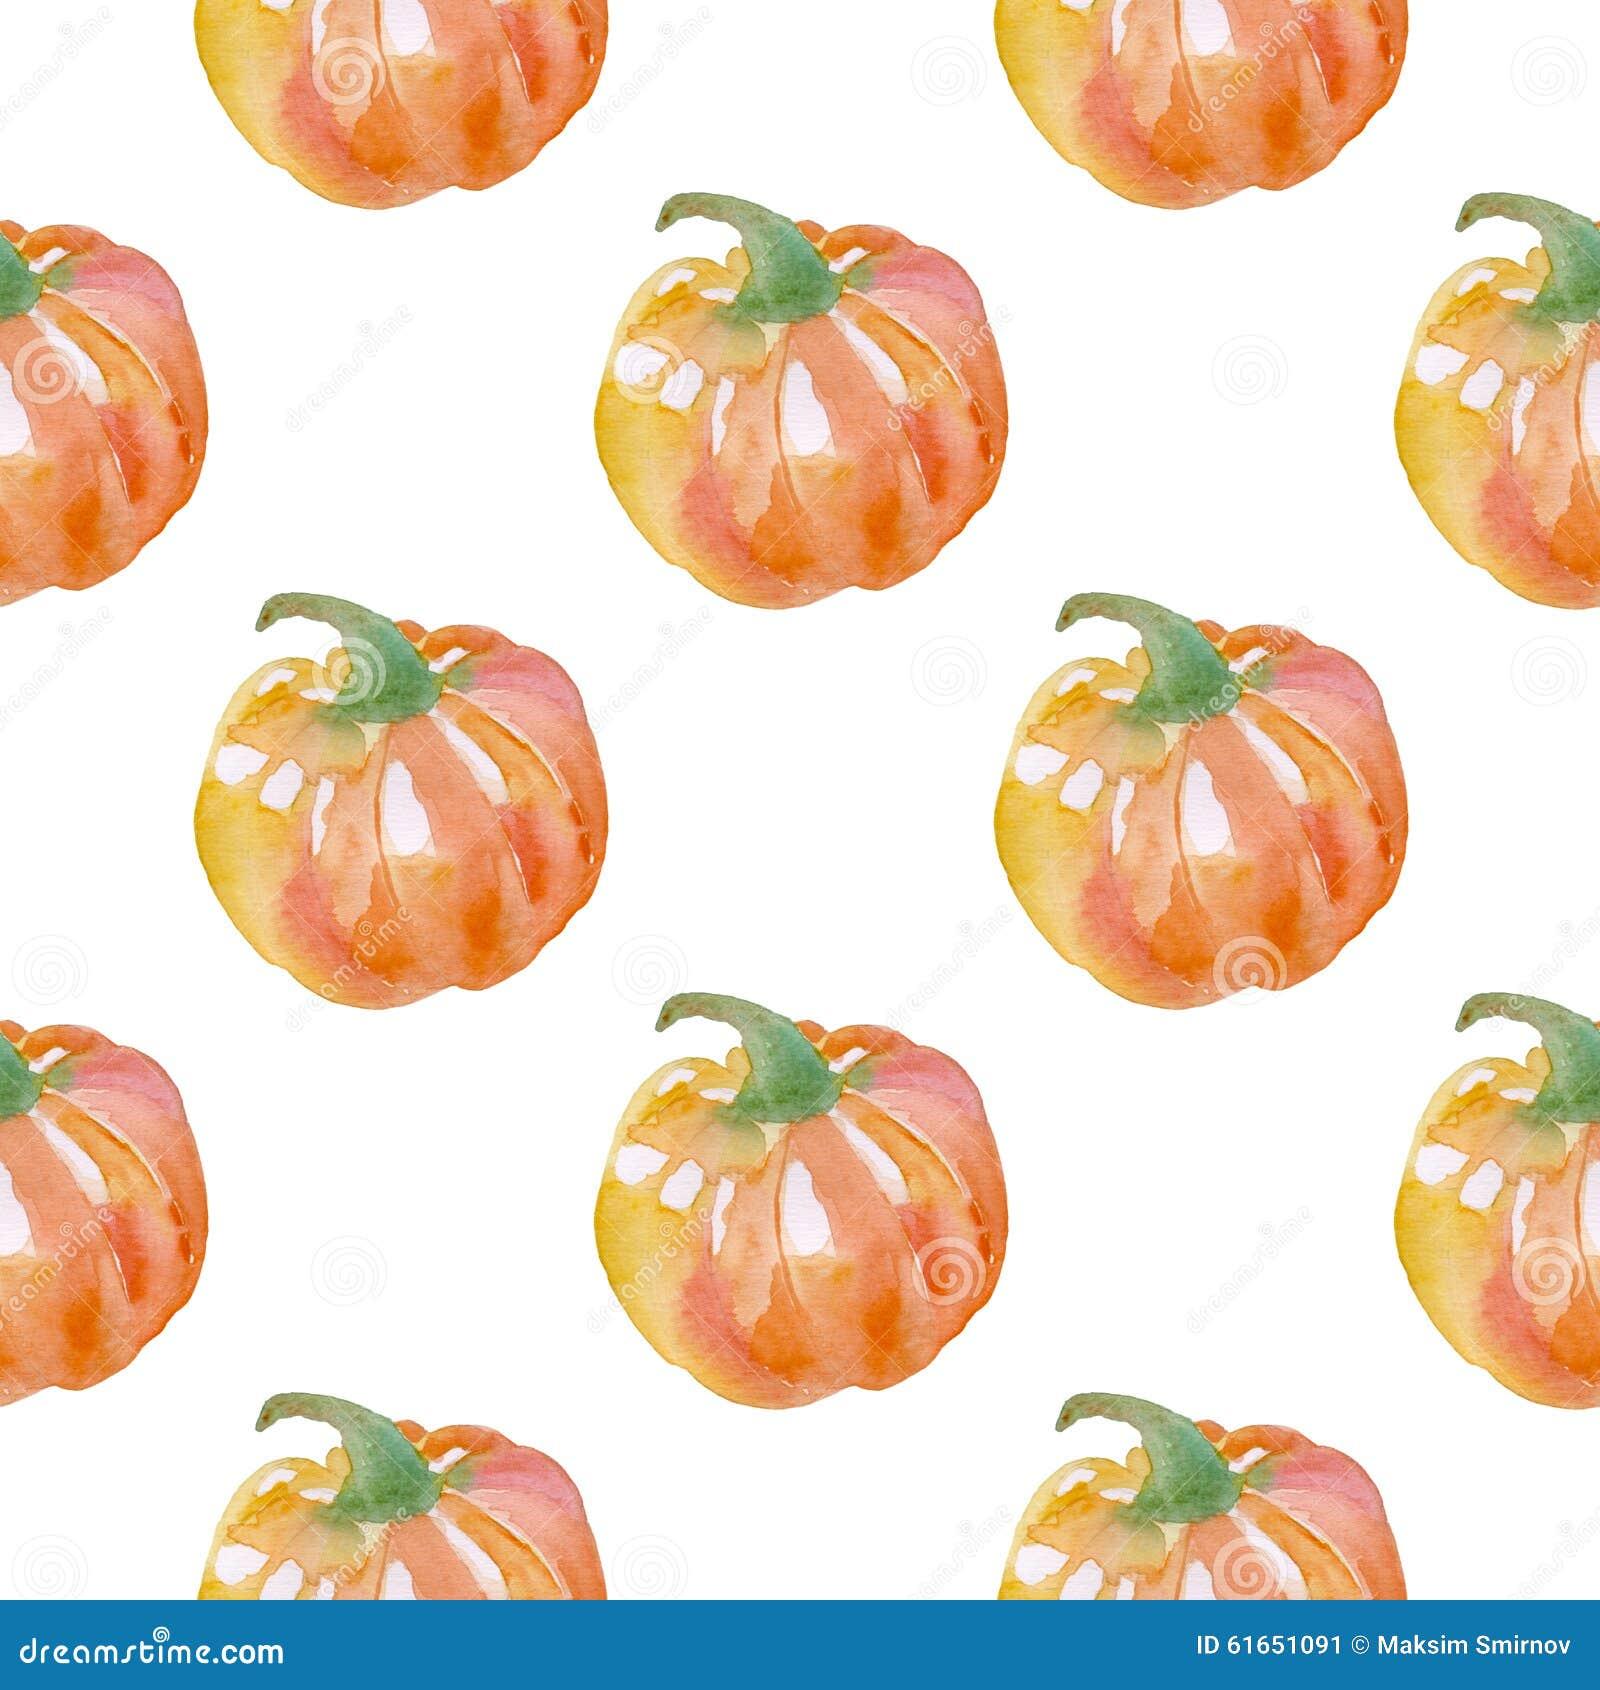 pumpkin pie vegetarian